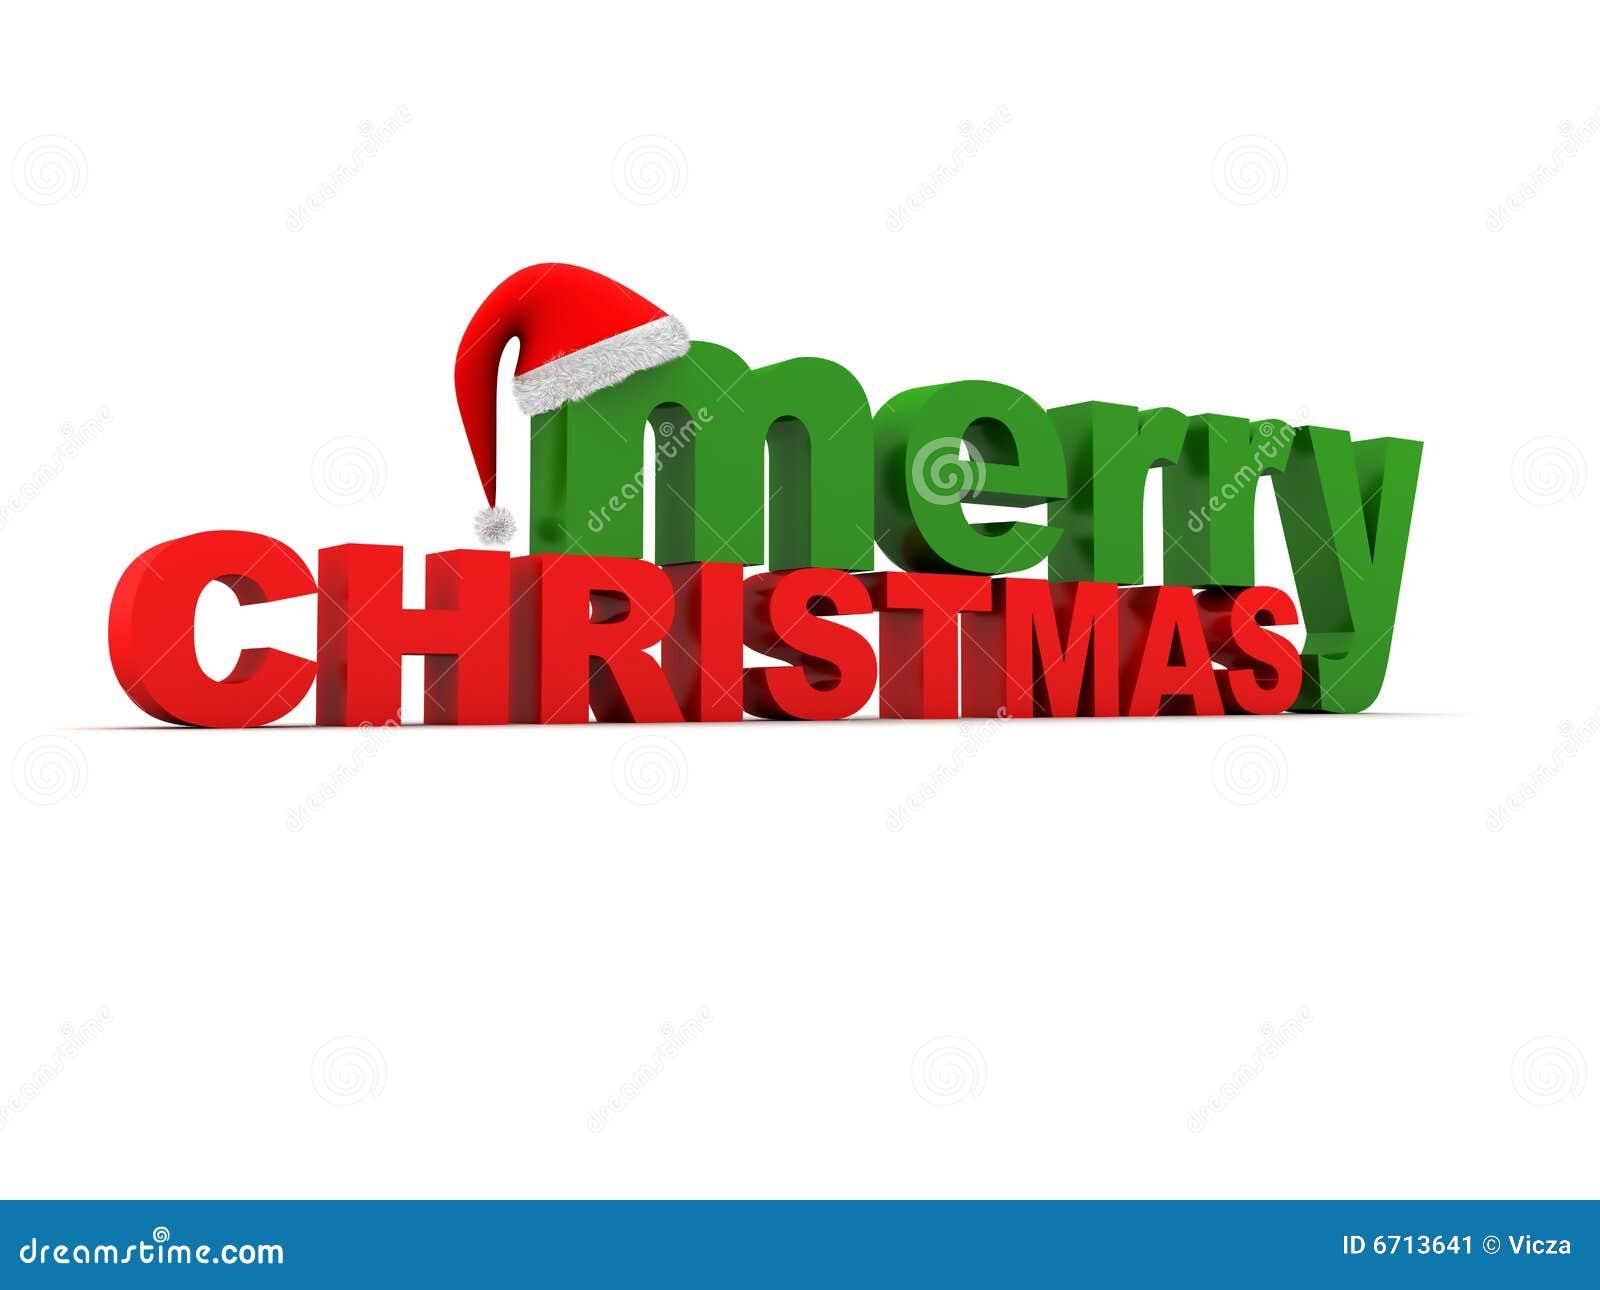 Merry Christmas Text Stock Image - Image: 6713641